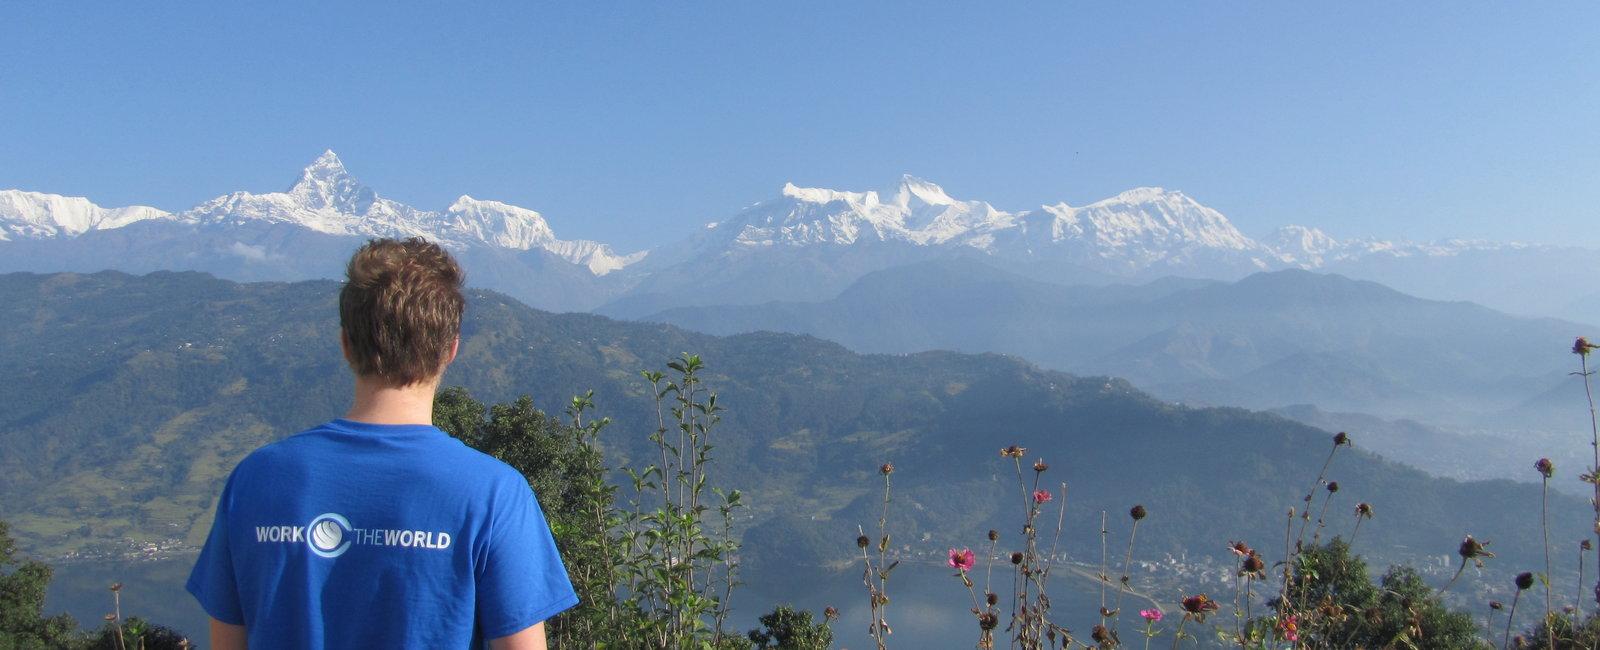 Jonathan Mazal - Radiography Electives in Nepal Pokhara